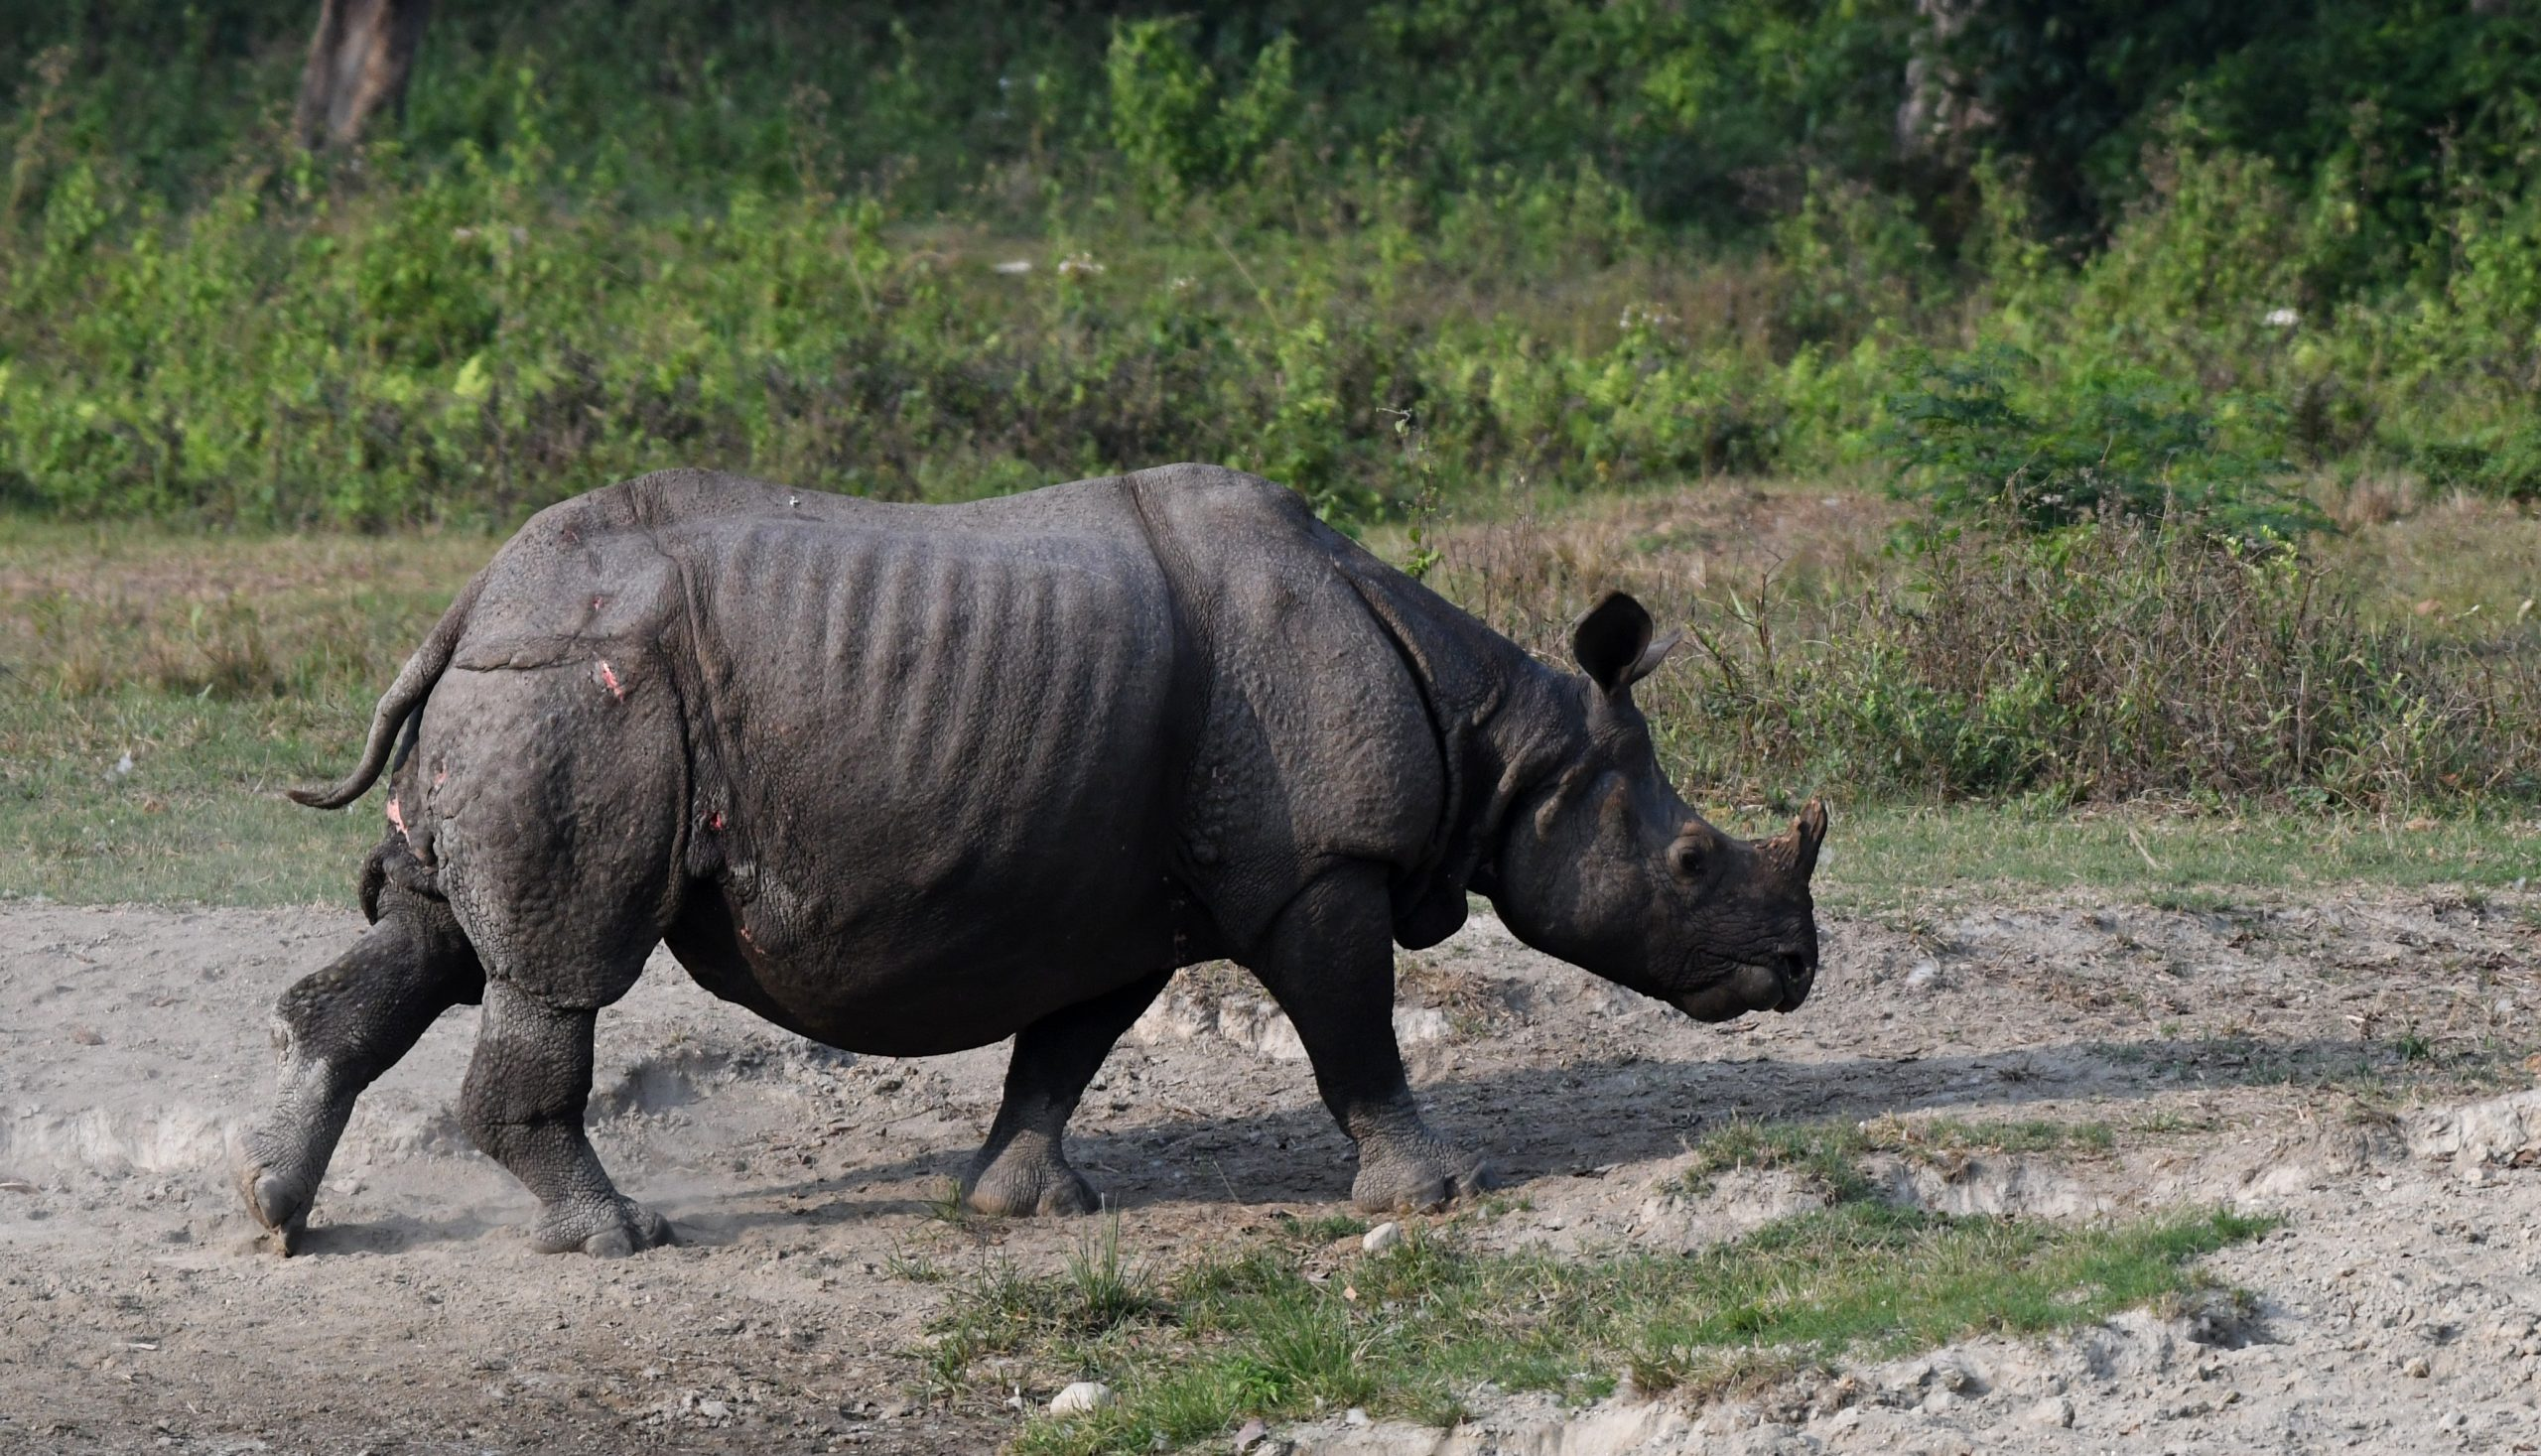 Indian Rhinoceros retreating after battle